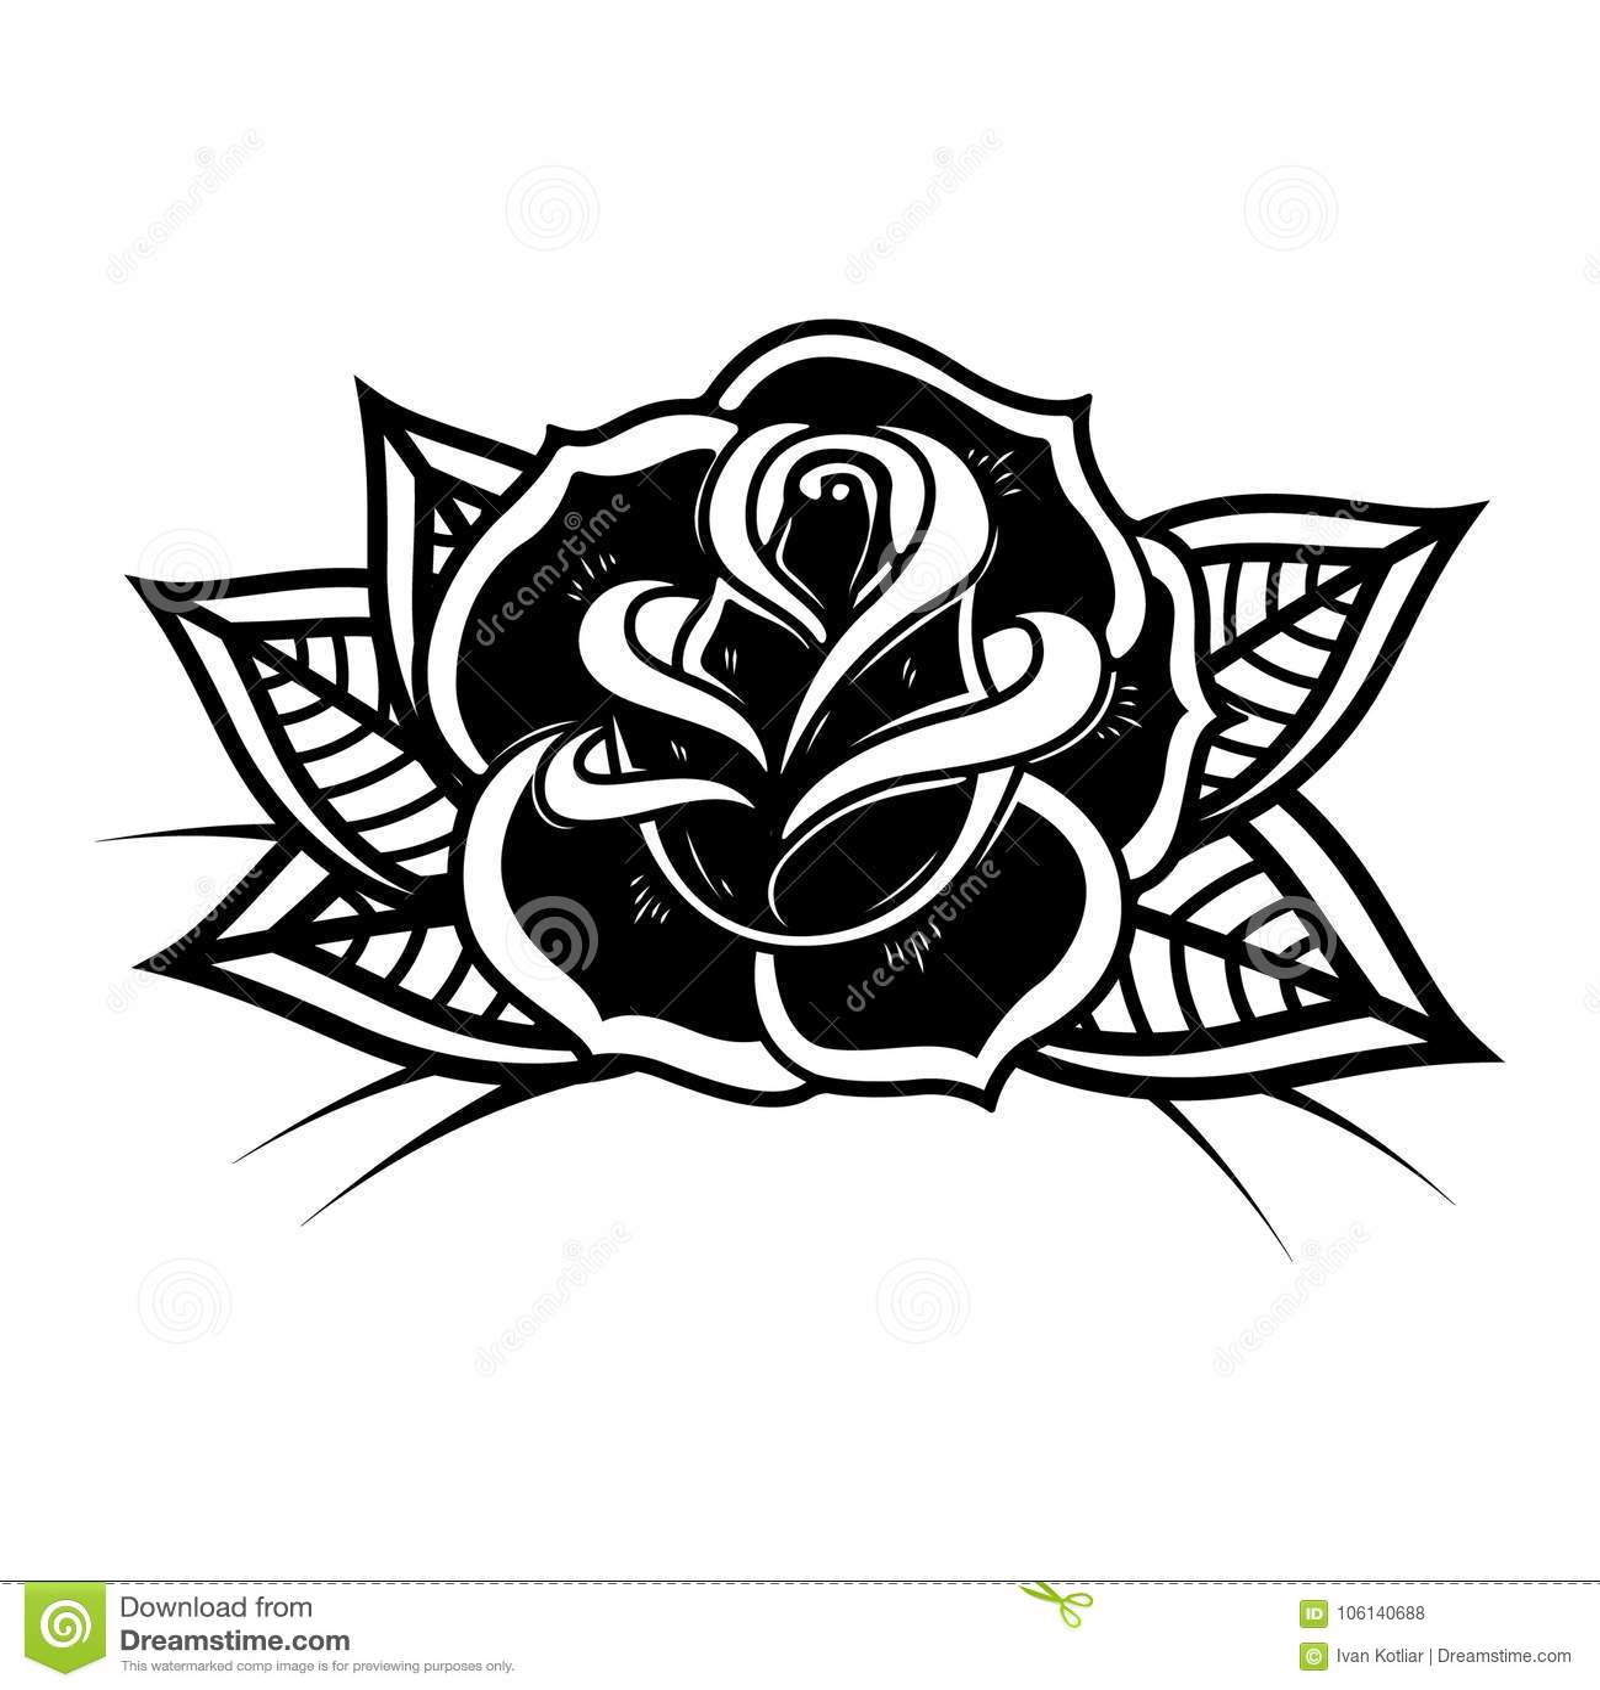 Tattoo style rose illustration on white background design for Tattoo style logo design